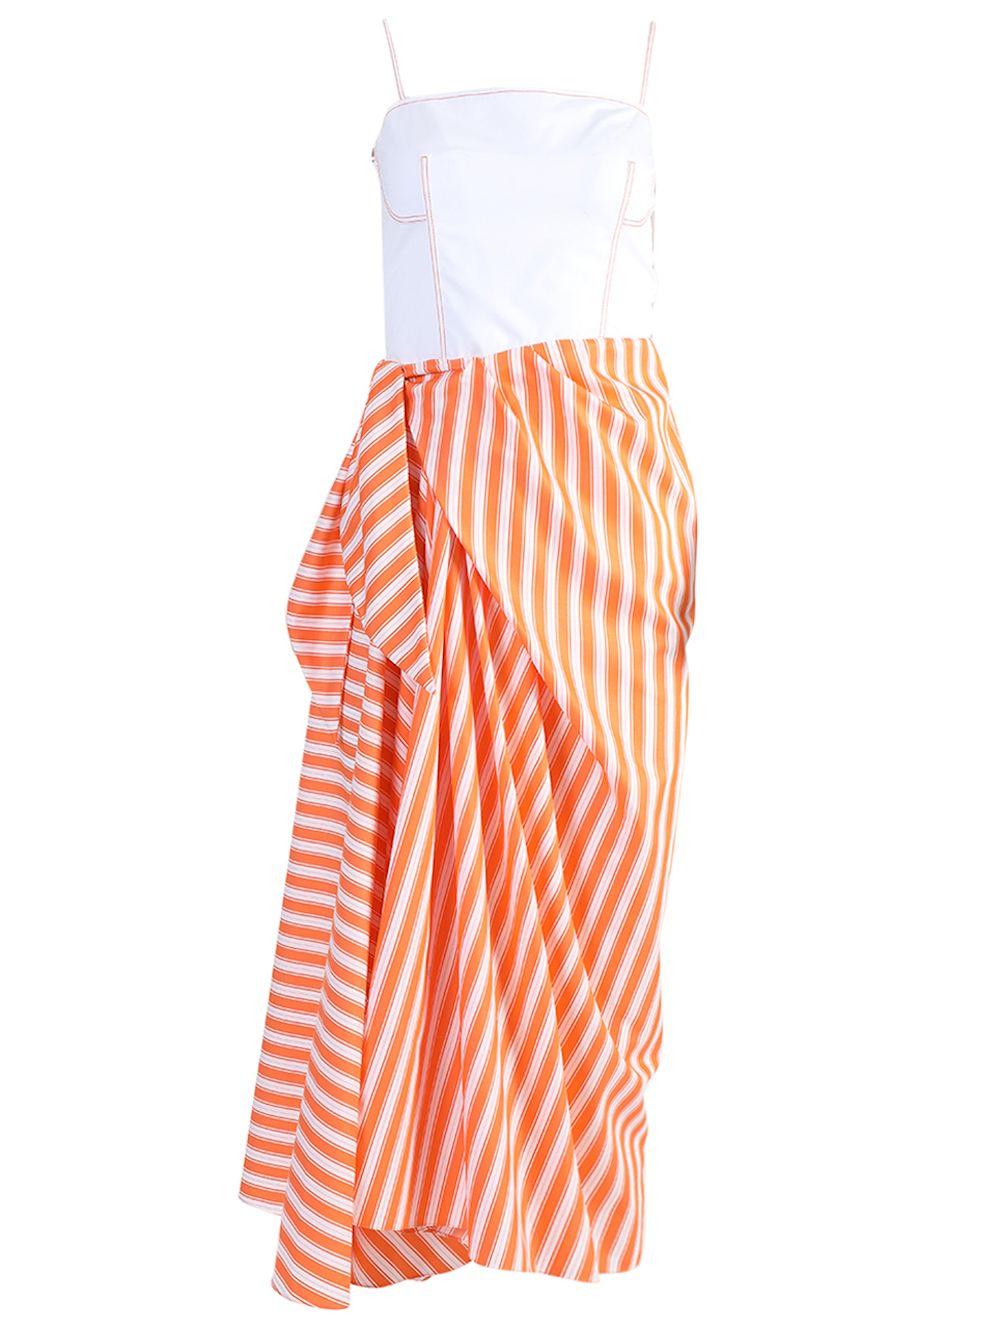 Rosie Assoulin CORSET DRESS WITH SARONG SKIRT